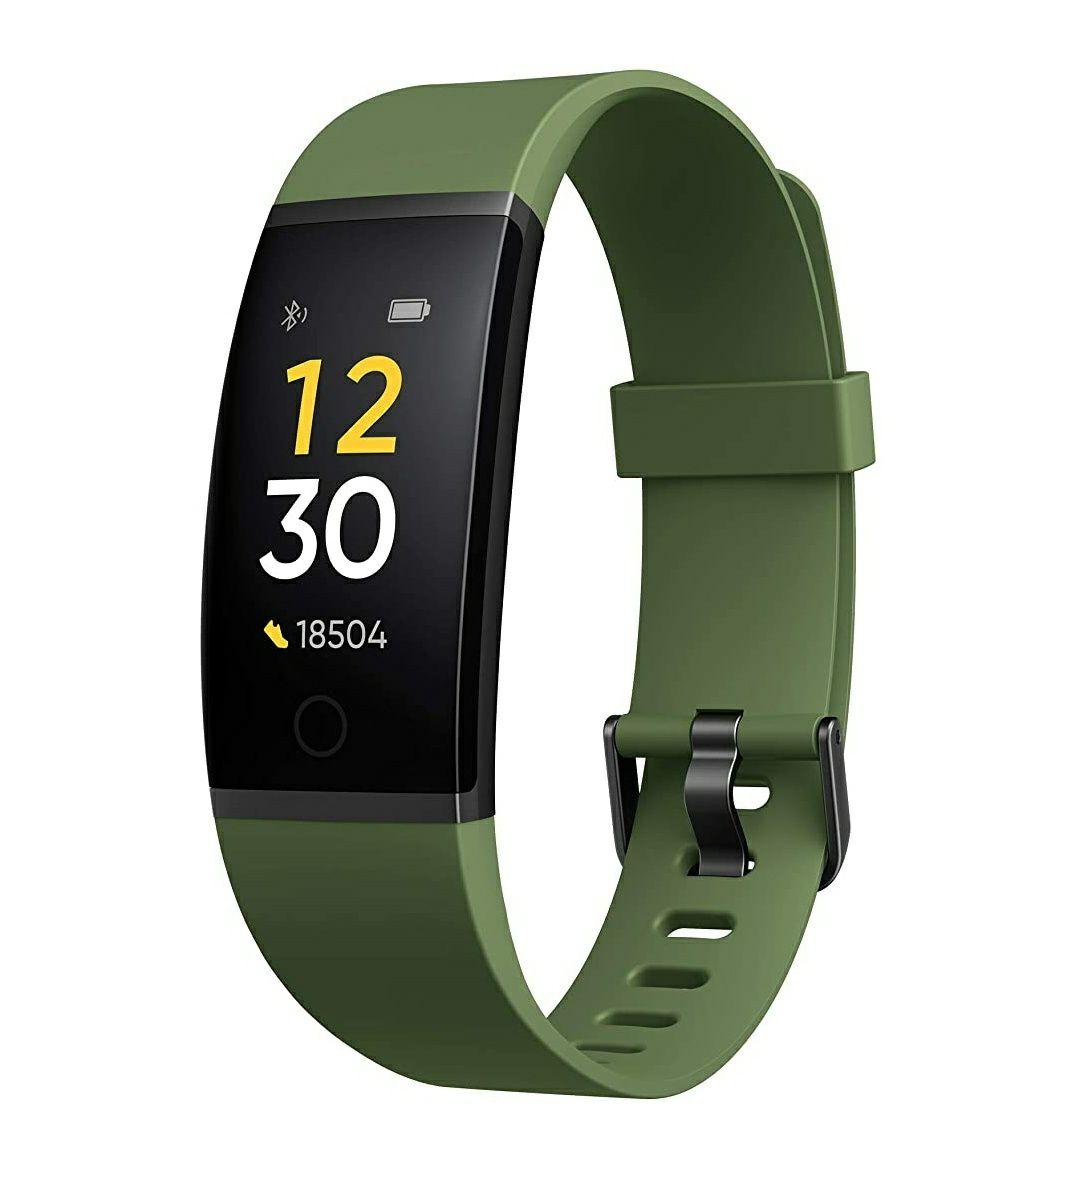 Realme Band 1 - Intelligent Health & Sports Tracker Large Colour Display - £24.99 @ Amazon